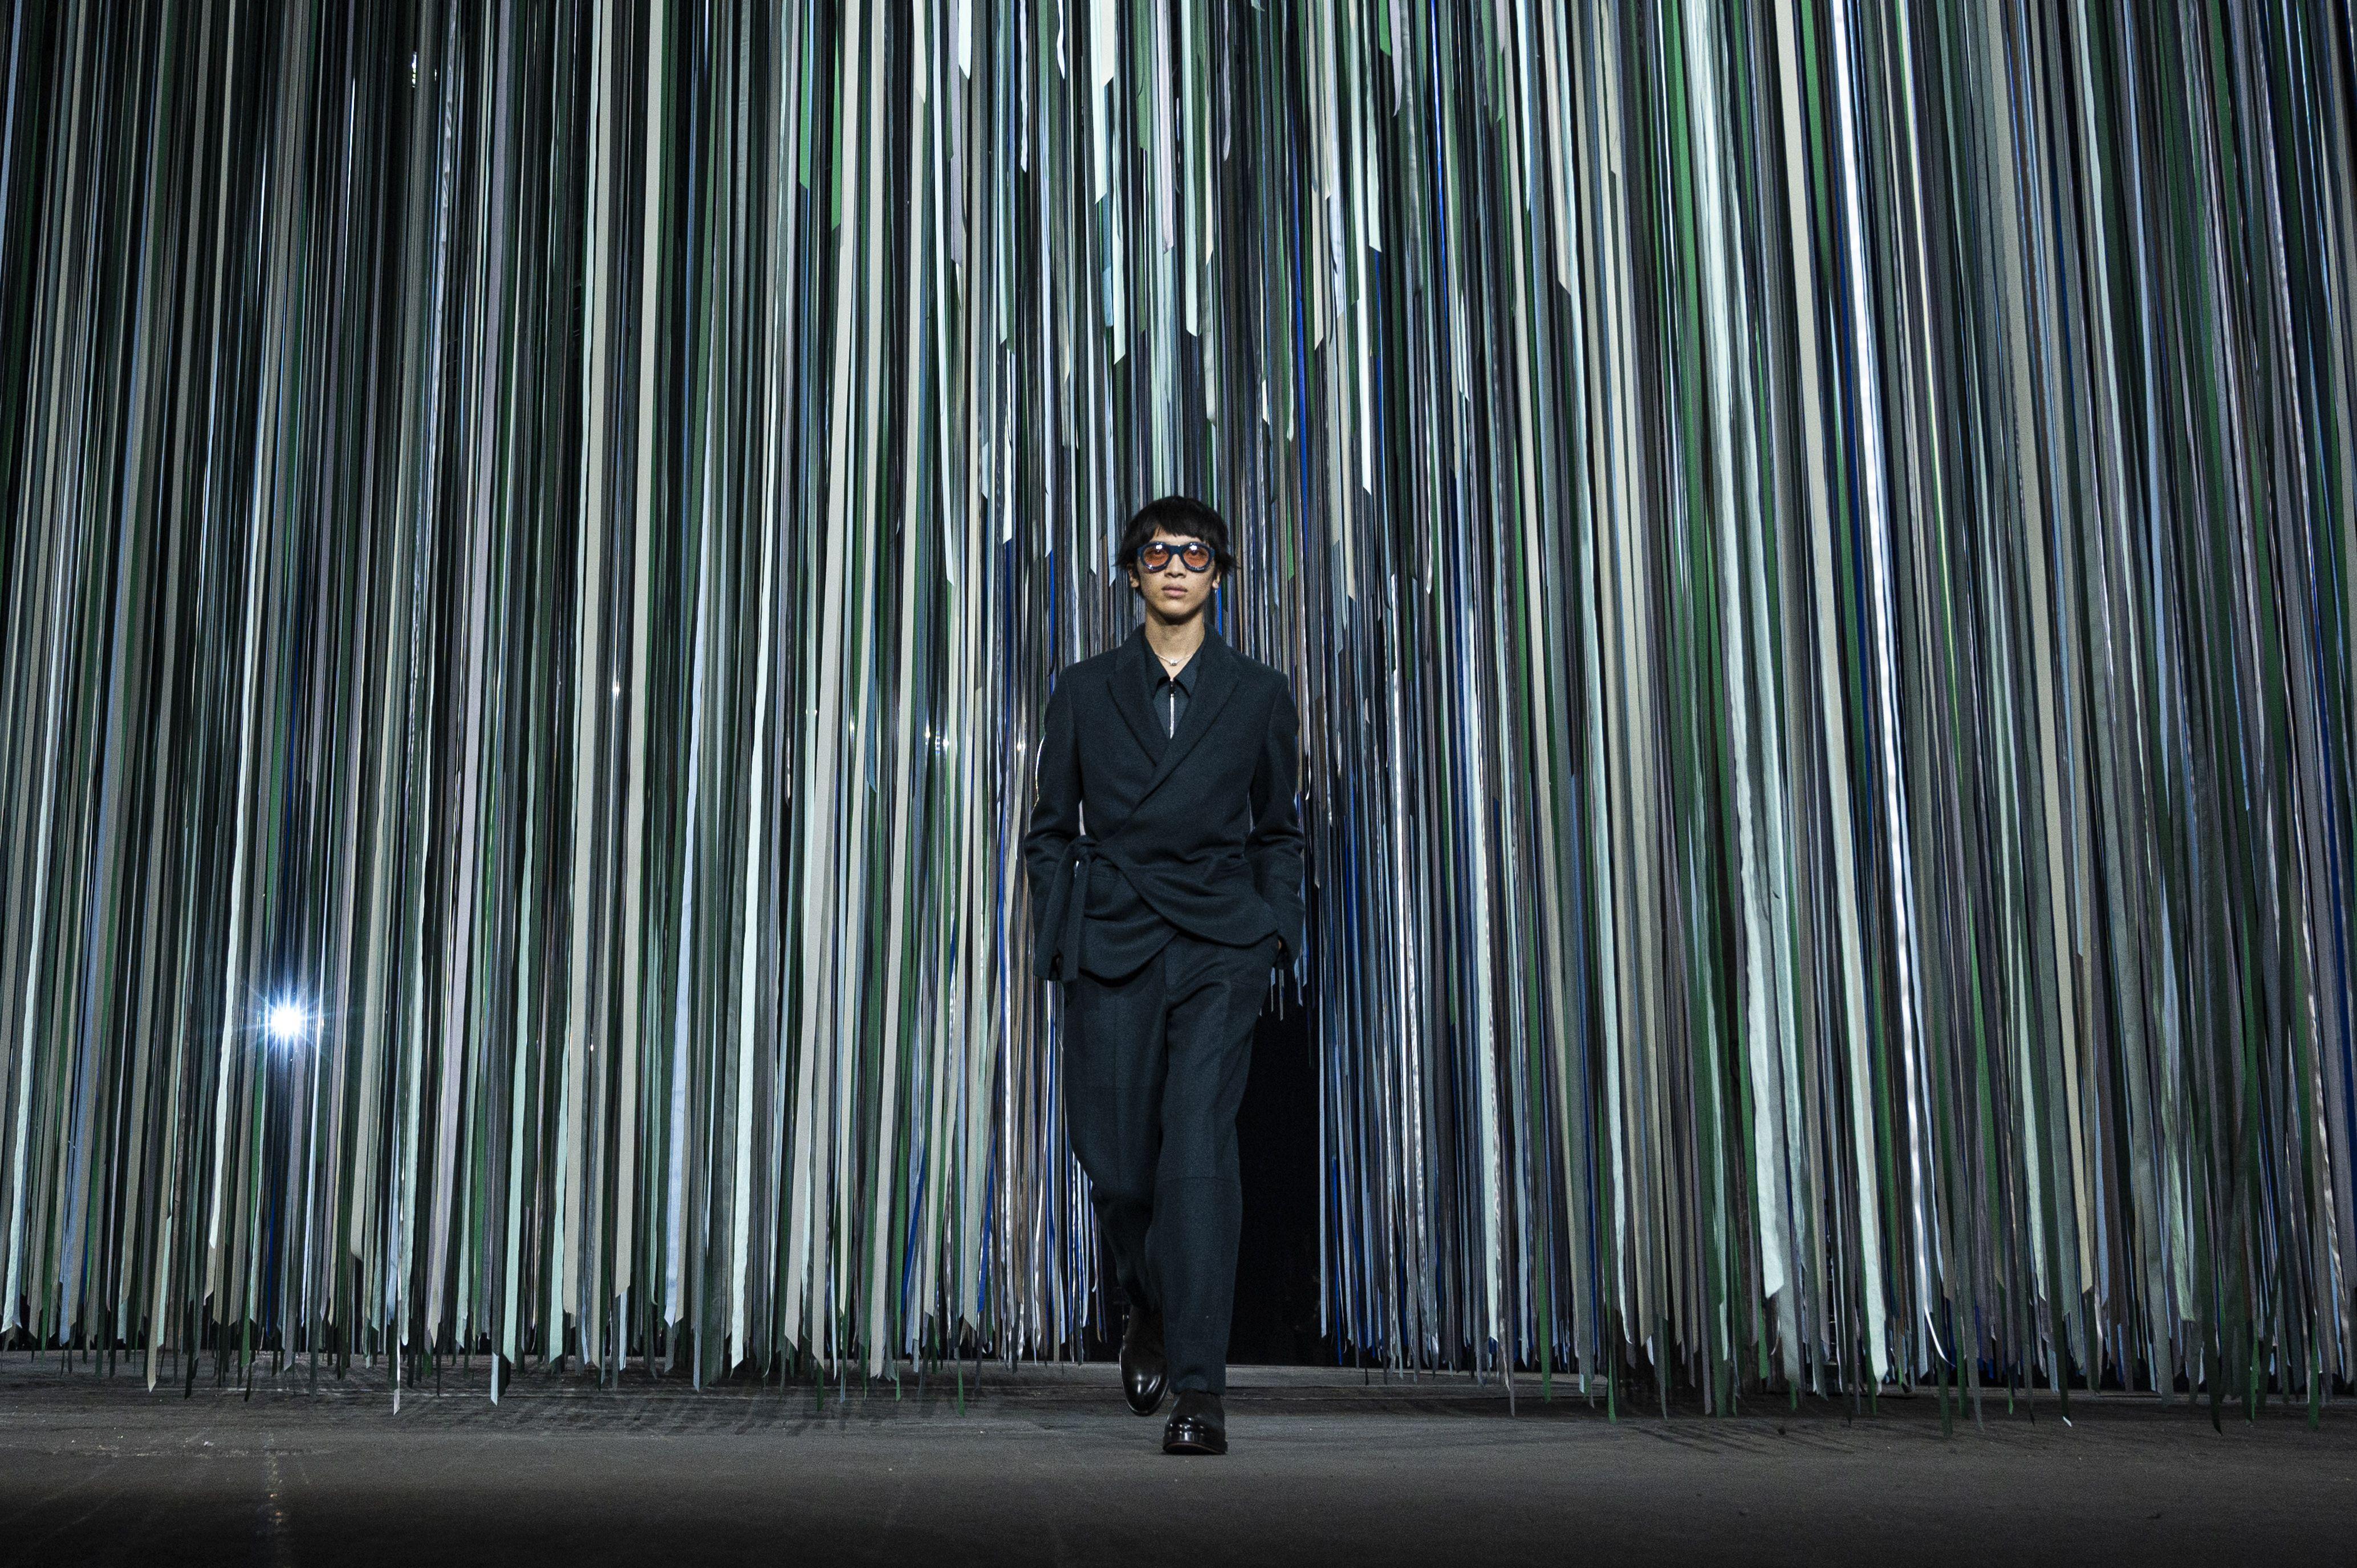 Milan Fashion Week: Ermenegildo Zegna Gives Darkness The Green Light